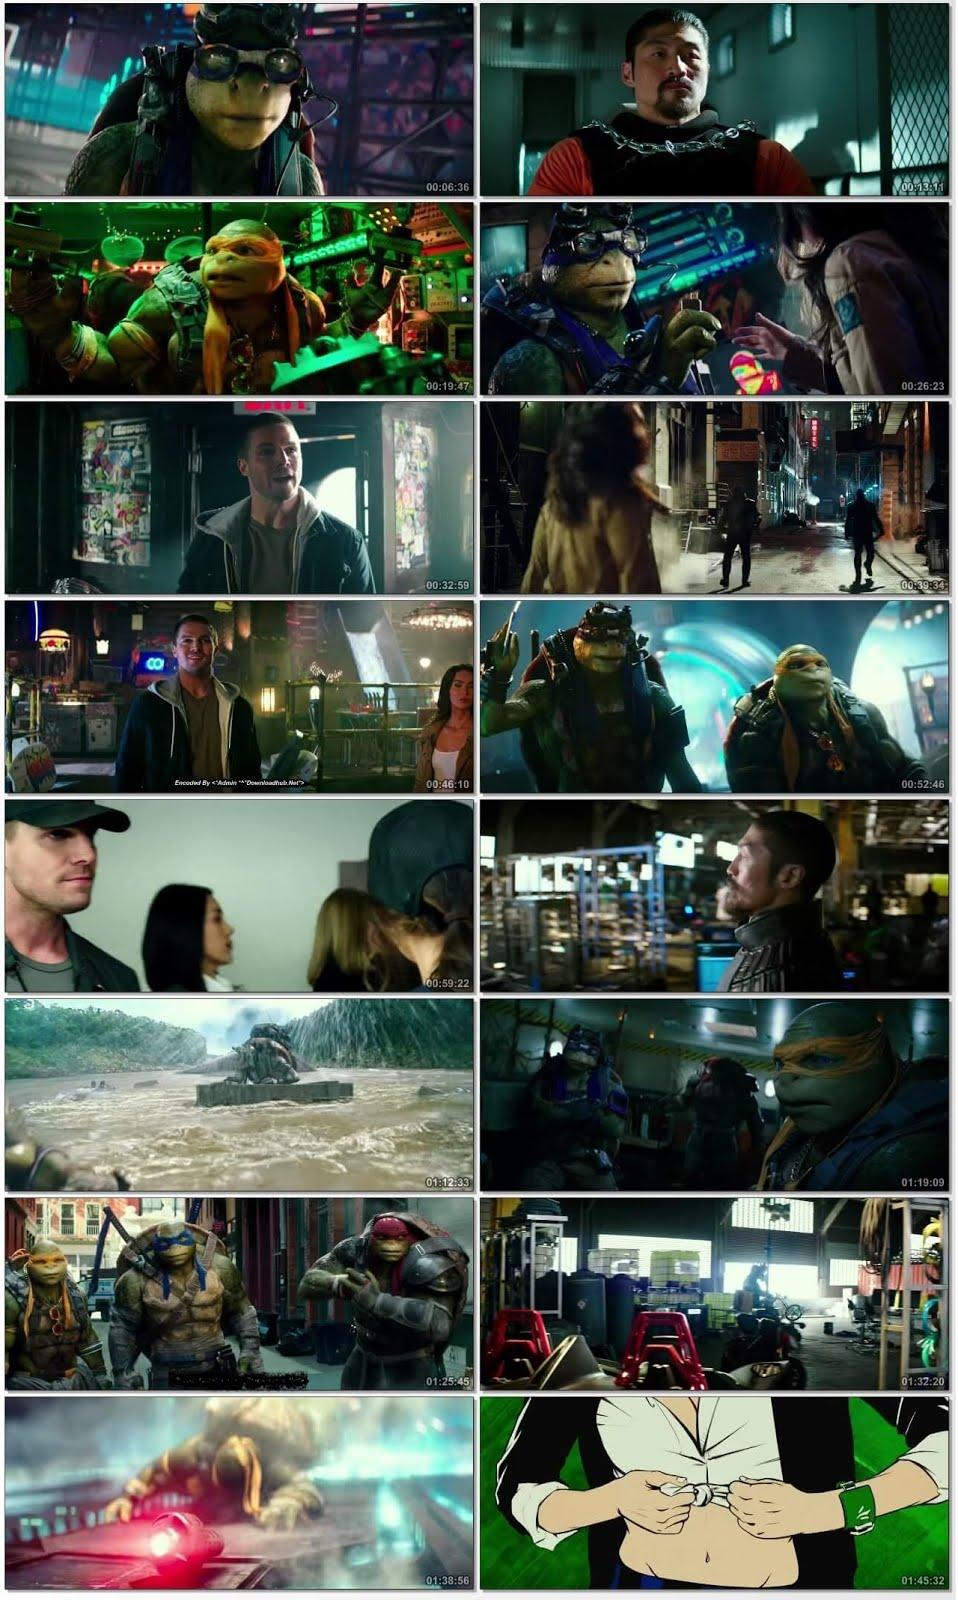 Teenage Mutant Ninja Turtles Out of the Shadows 2016 ORG Dual Audio 720p BluRay [Hindi – English] ESubs